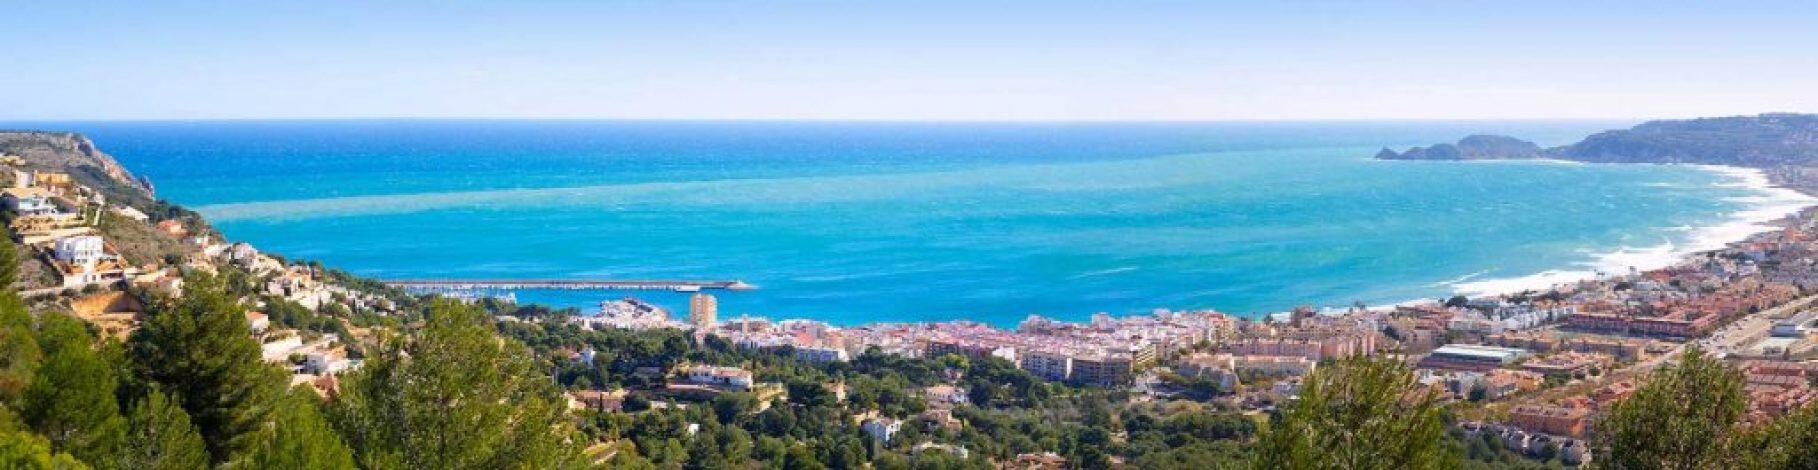 Javea beach skyline